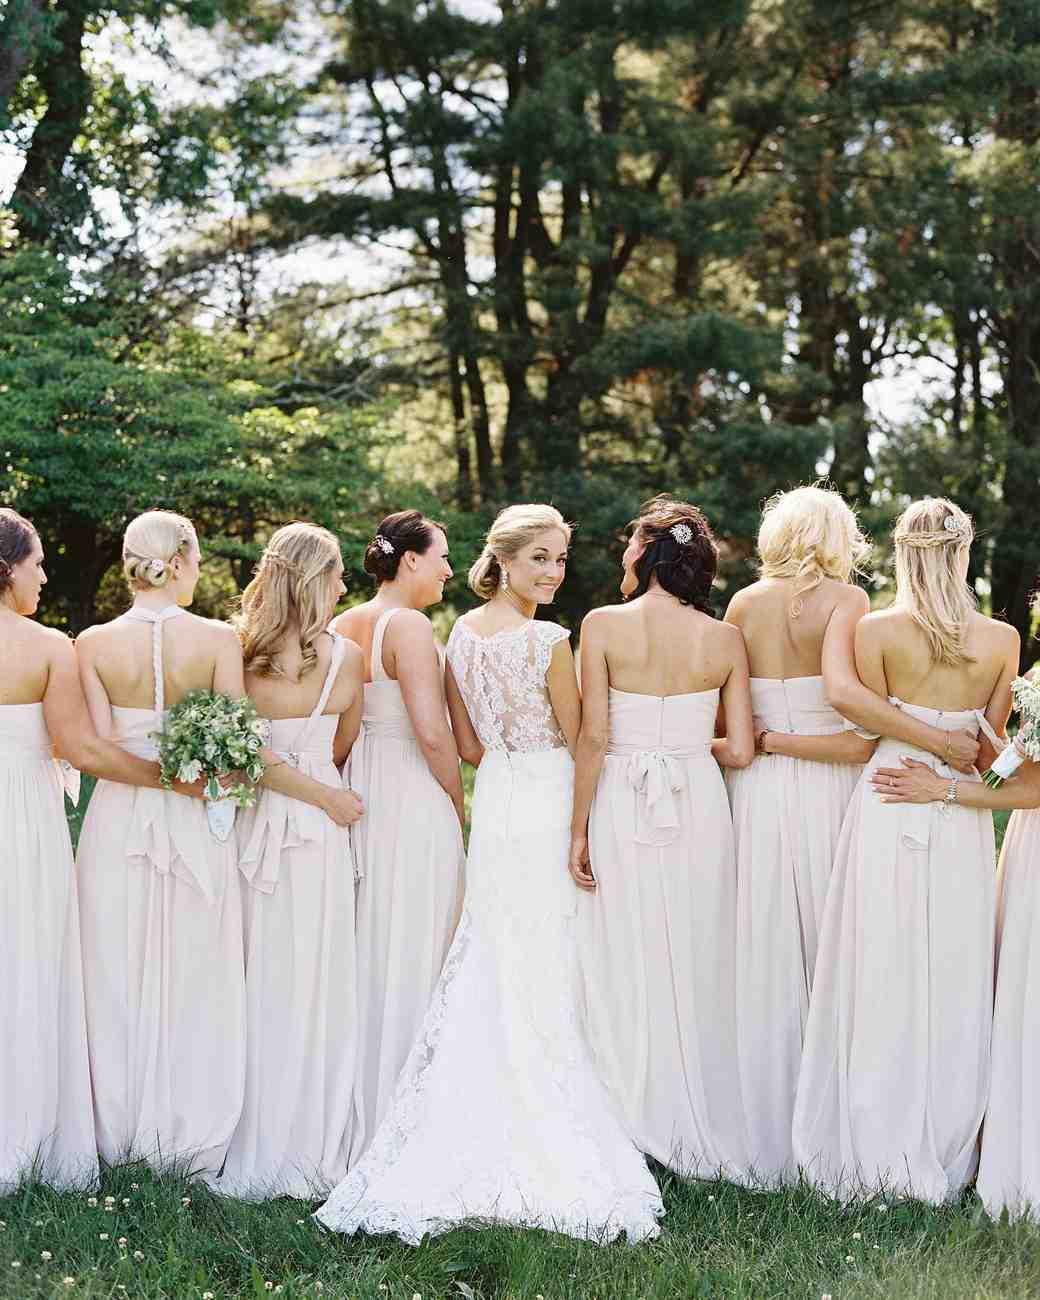 bridal-party-candids-8-0416.jpg